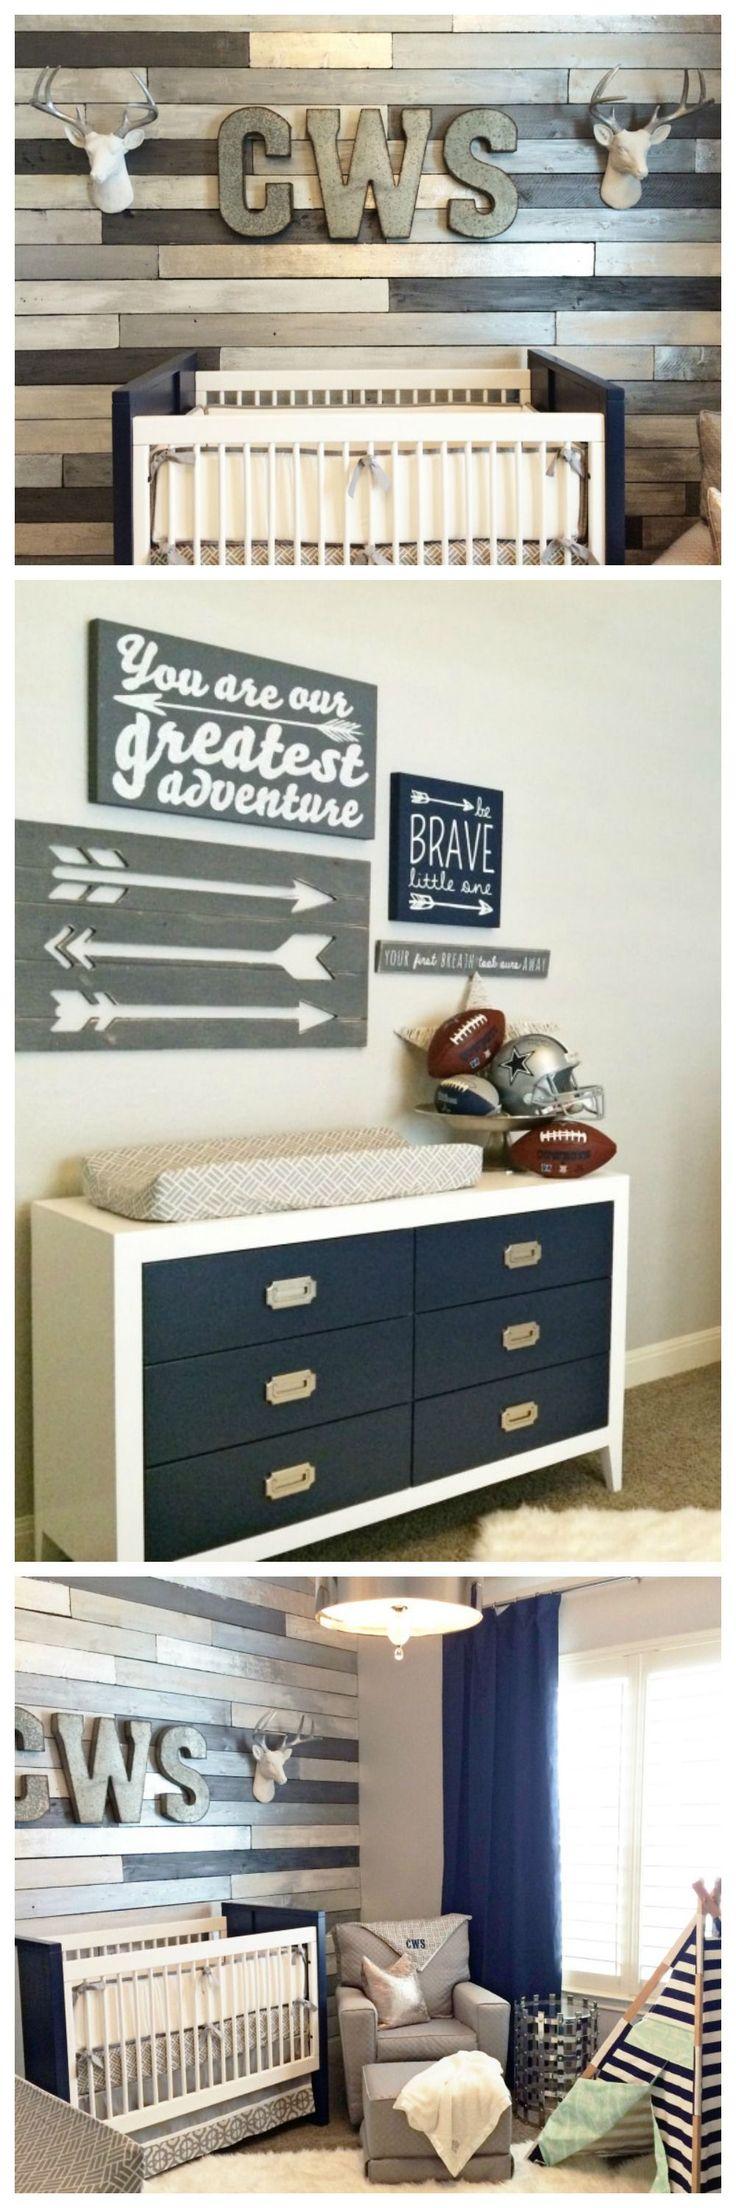 Metallic Wood Wall Nursery - love the rustic, yet modern decor in this baby boy room! #babyboynursery